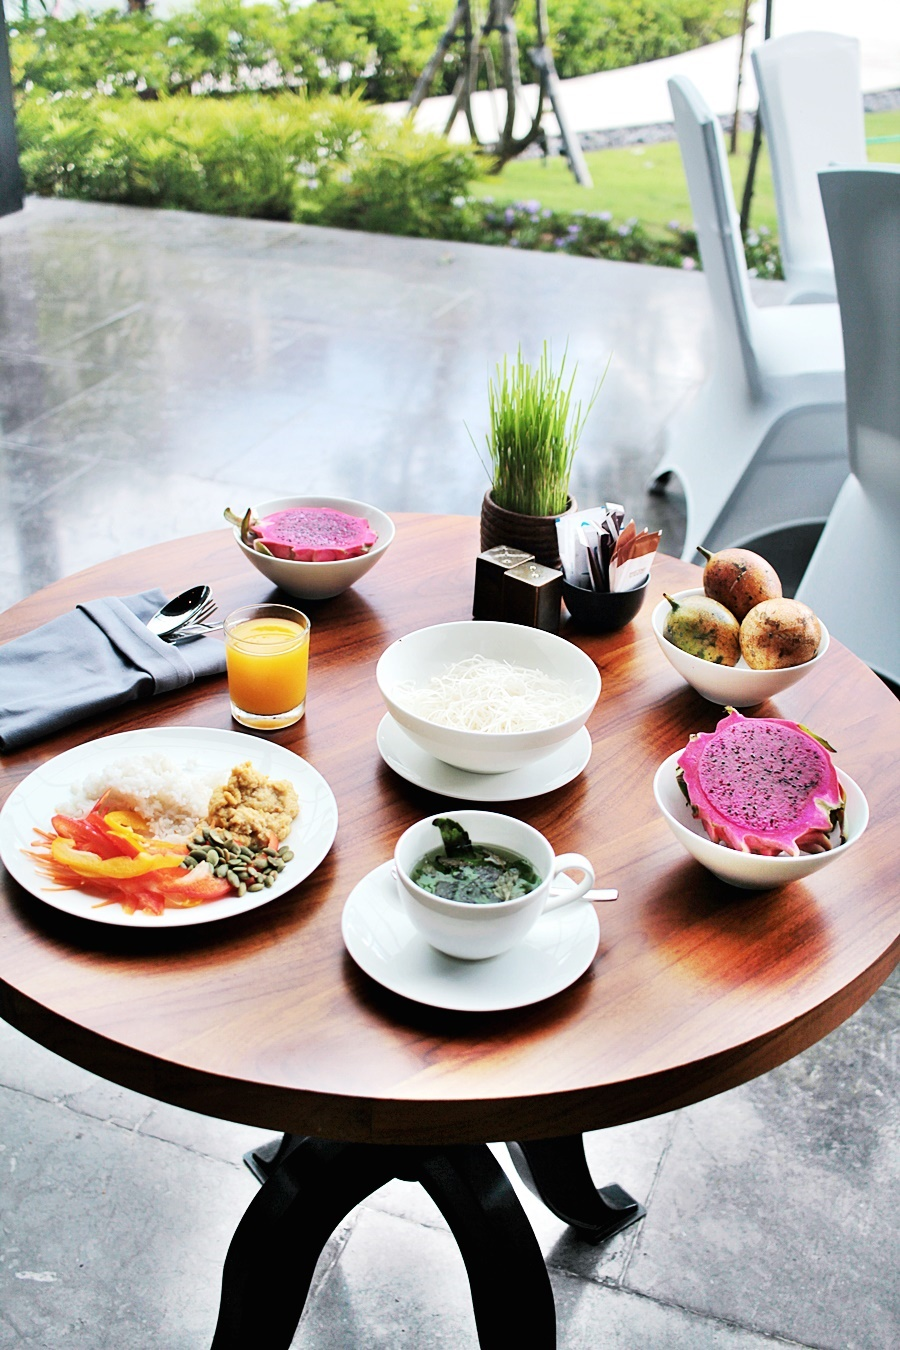 dragonfruit hotel breakfast